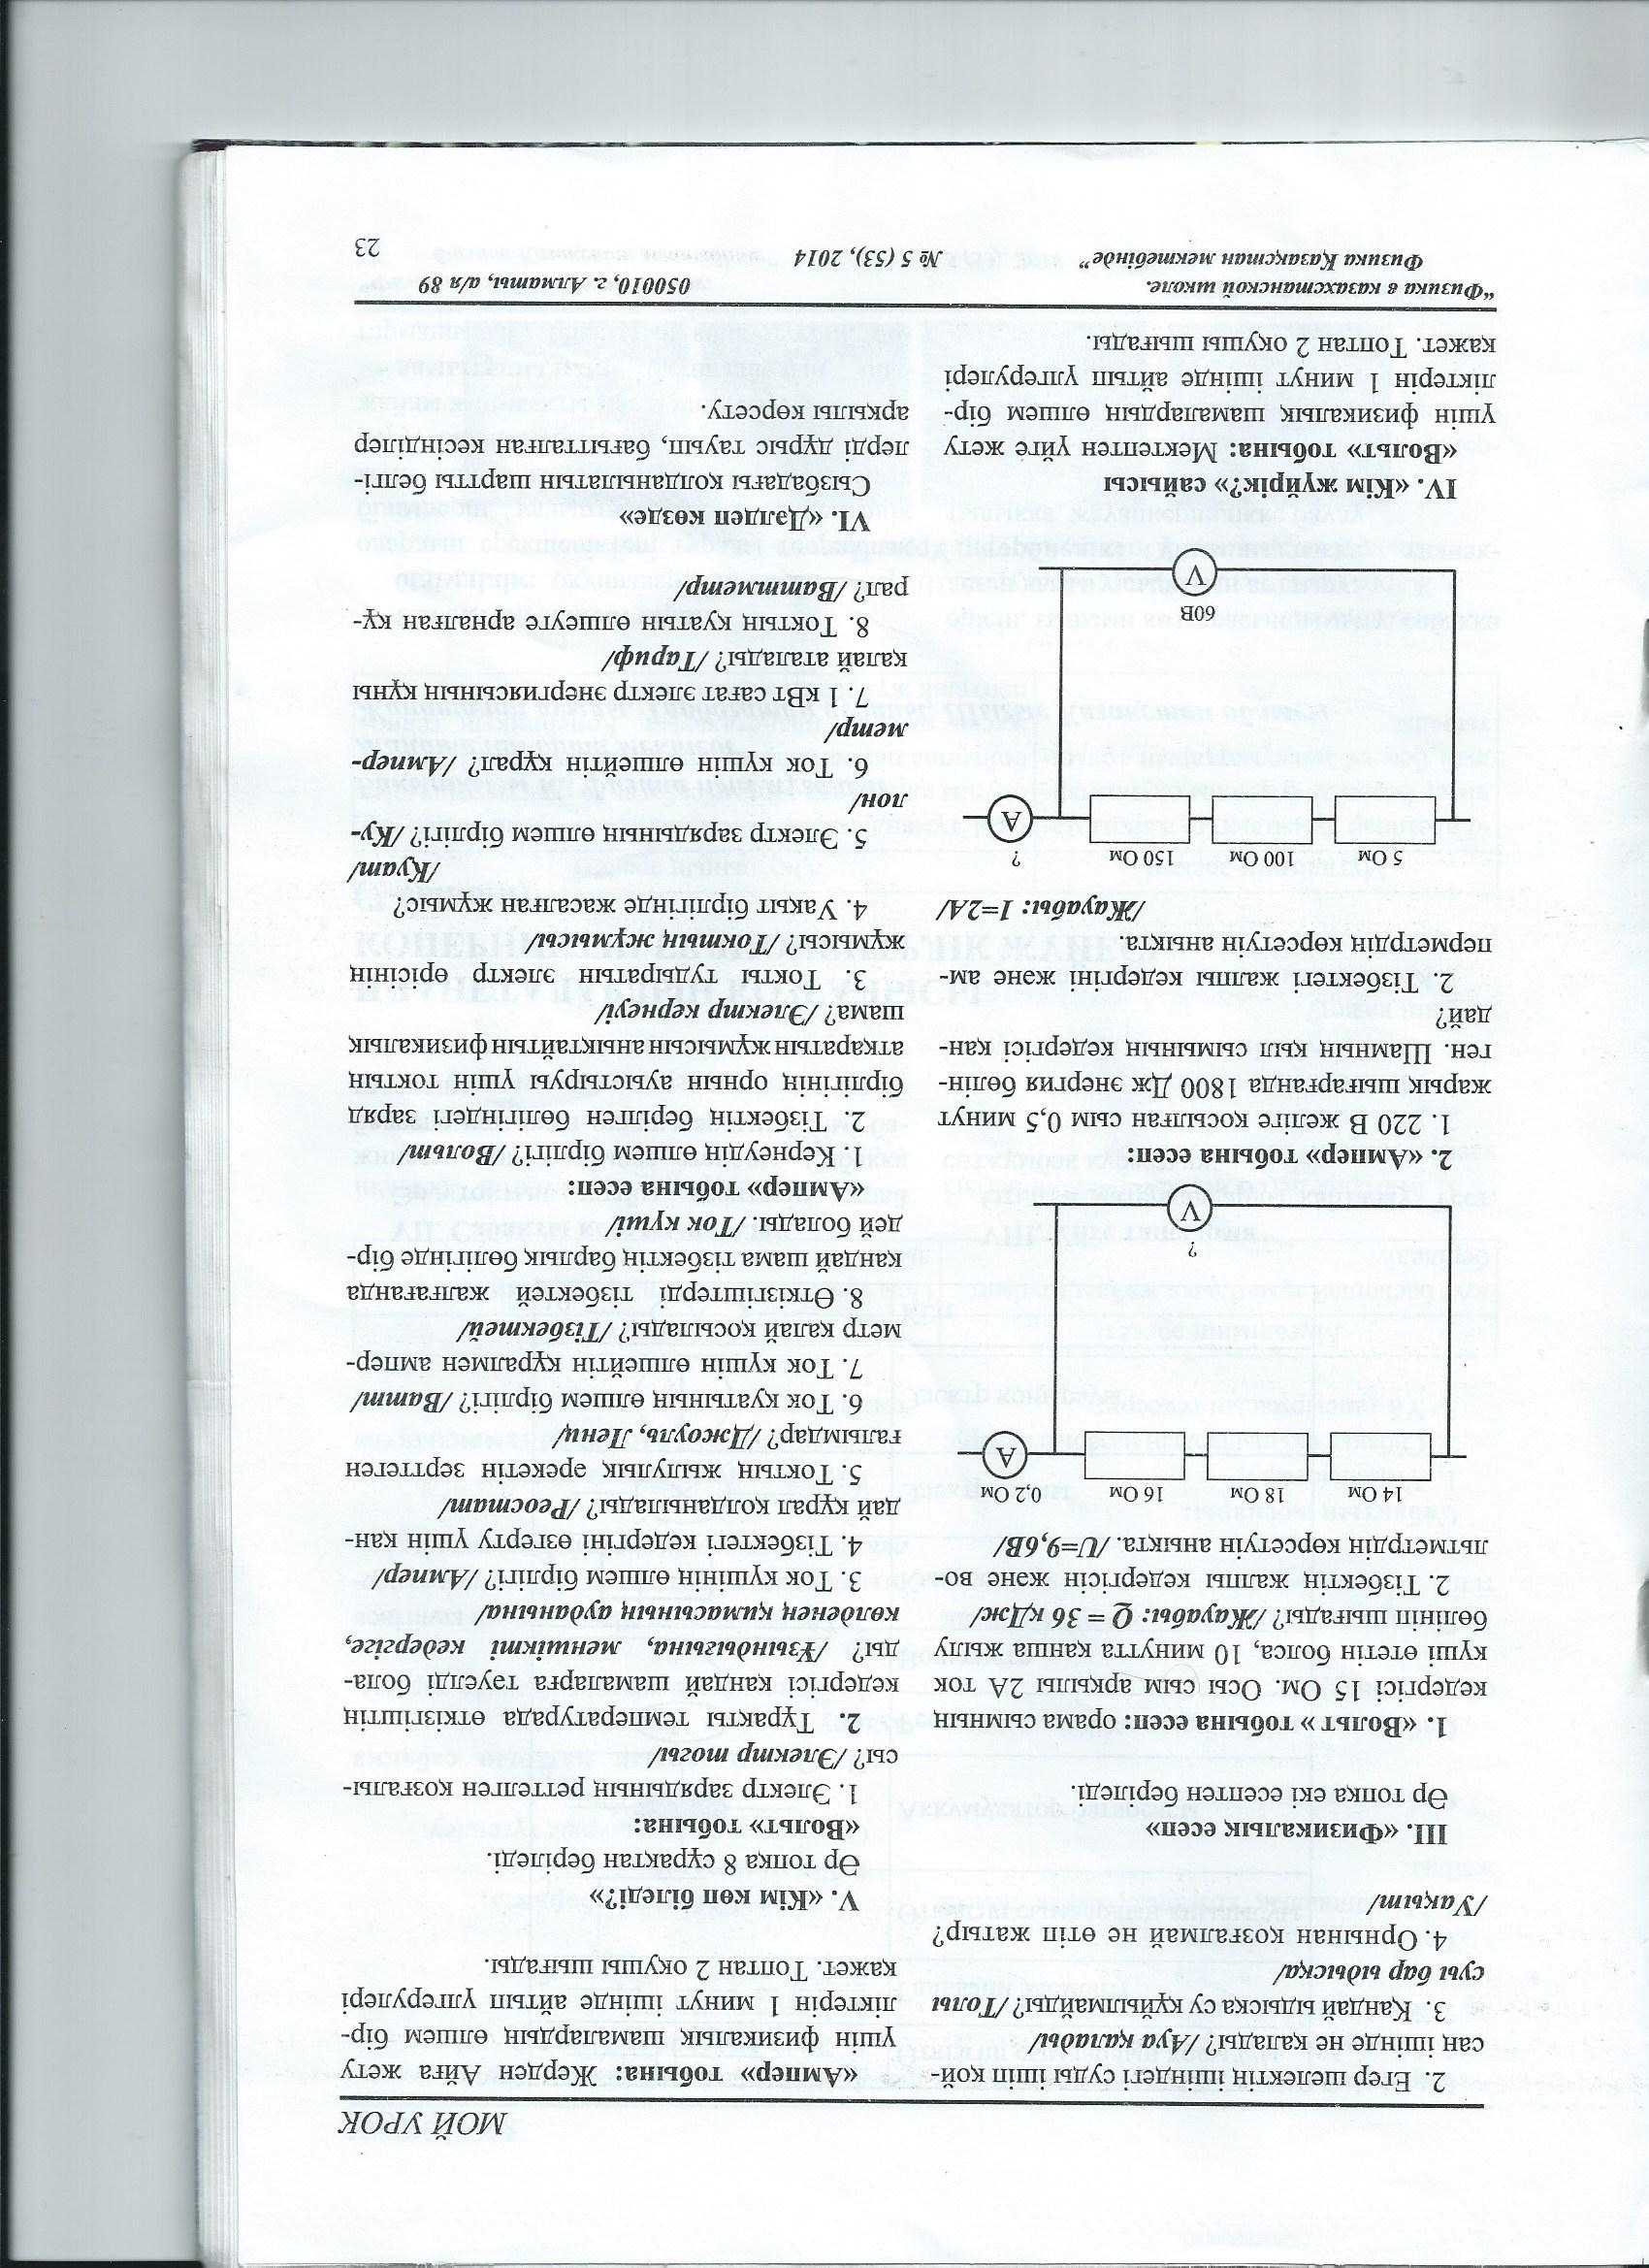 C:\Users\Pentium\Desktop\Новая папка\26.jpg